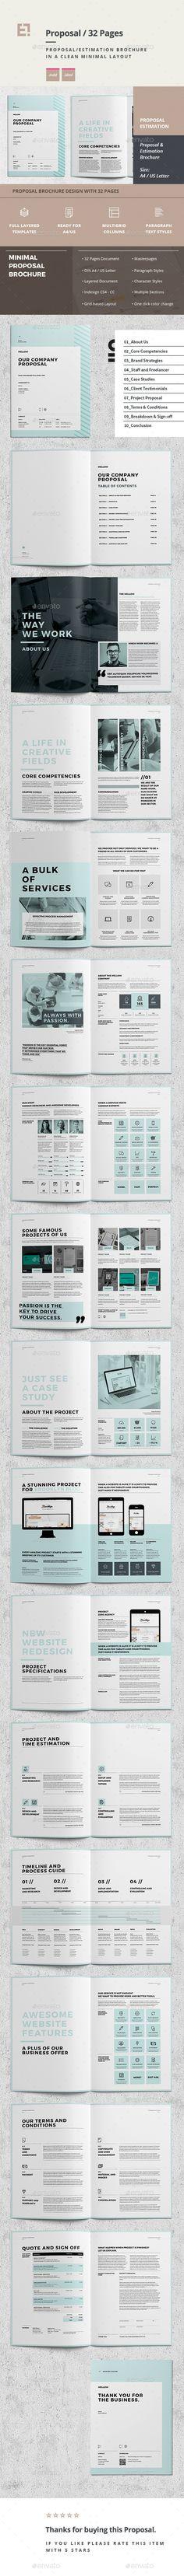 Sleman Clean Proposal Template Pinterest